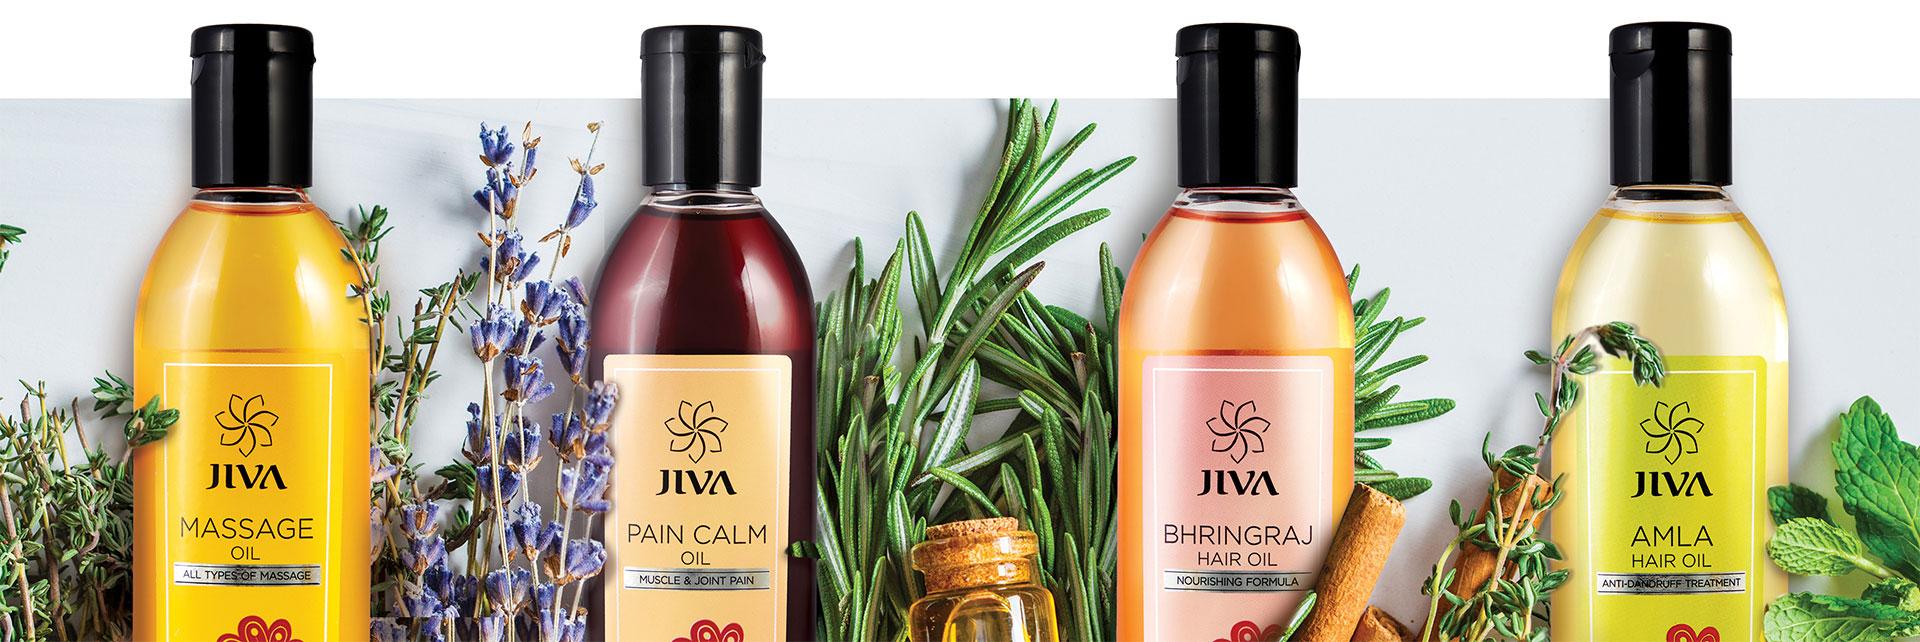 illustration - set of oils from Jiva